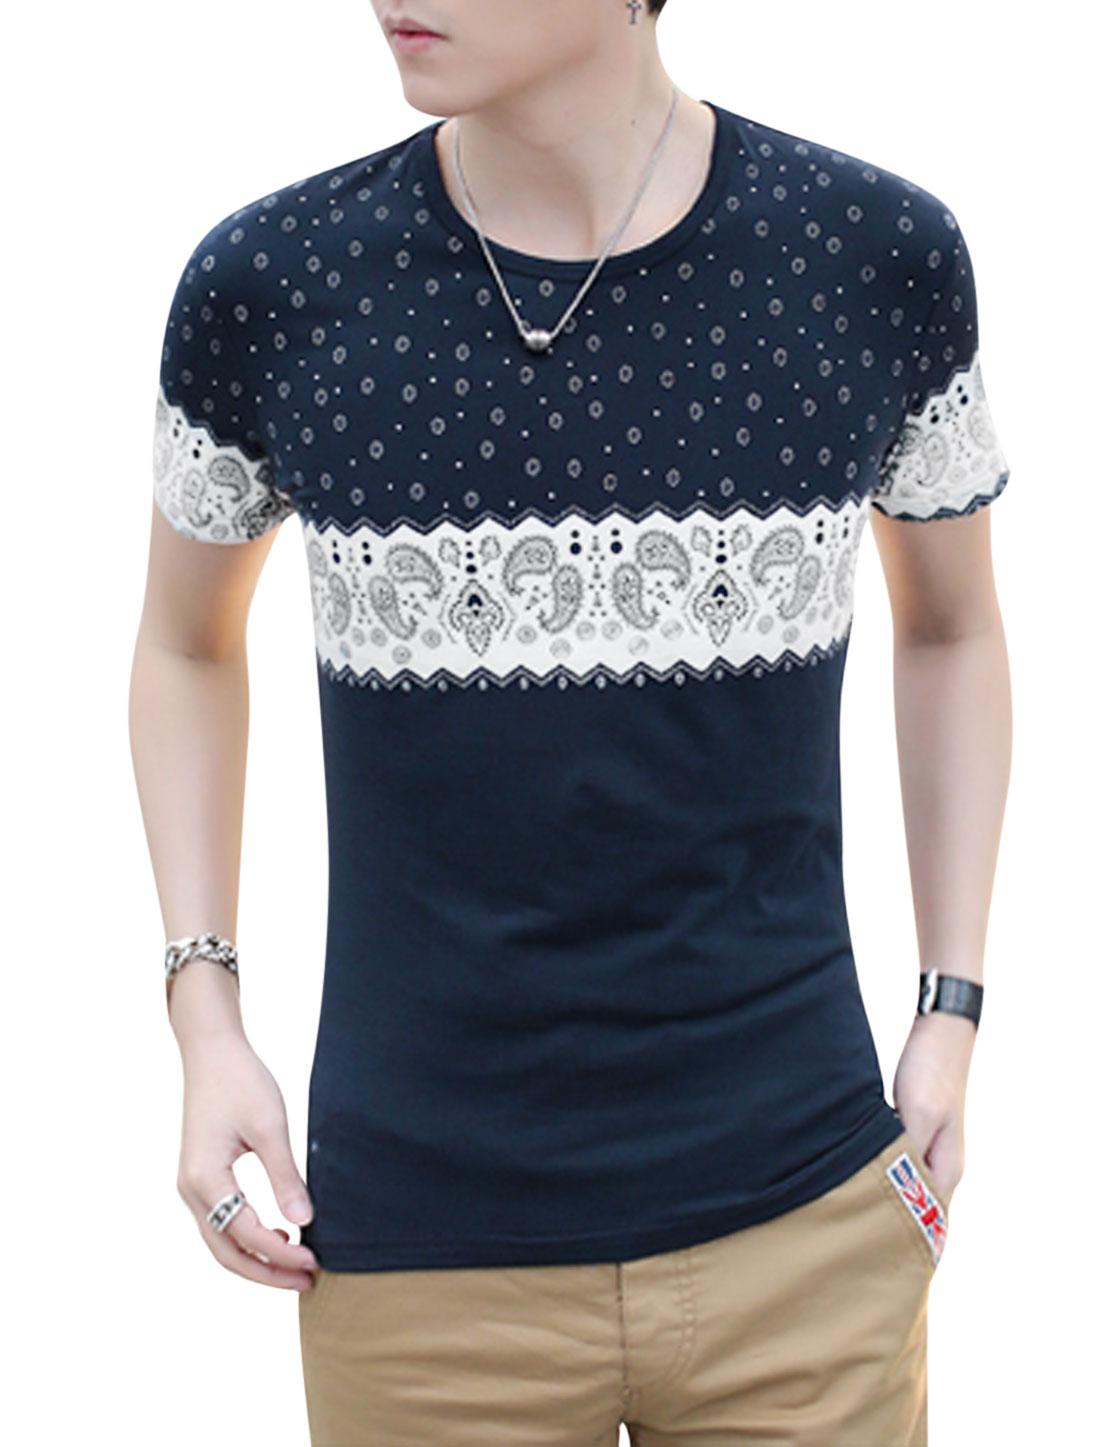 Men Short Sleeve Round Neck Novelty Paisleys Print Casual T-Shirt Navy Blue M